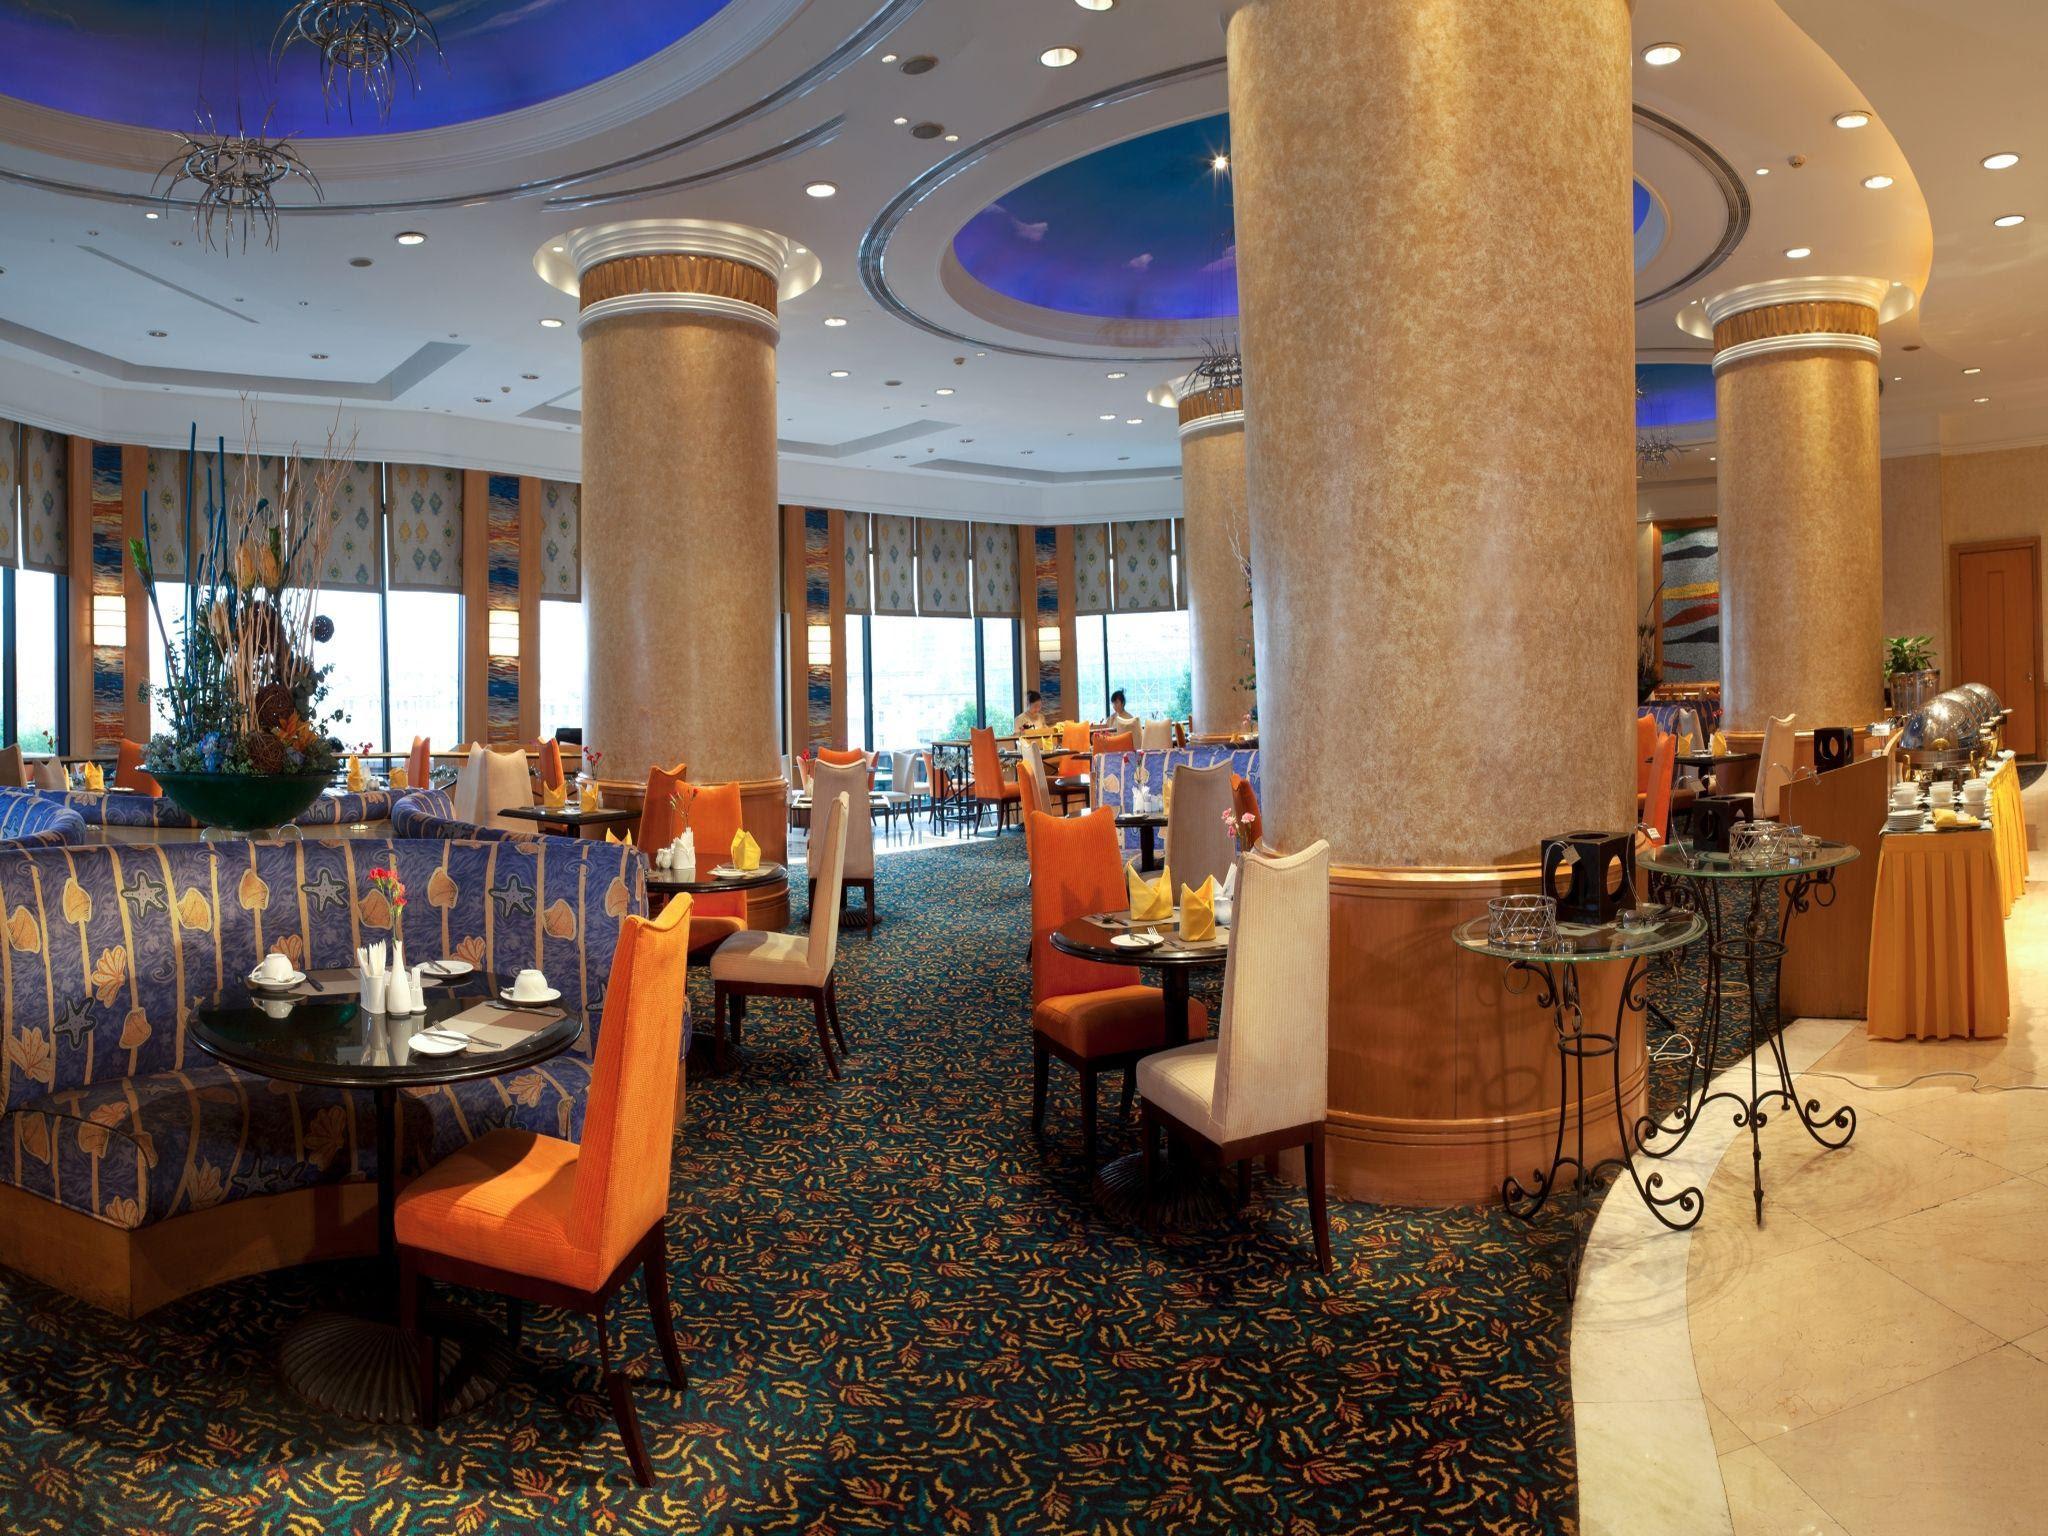 Review Nanjing Dingshan Hotel